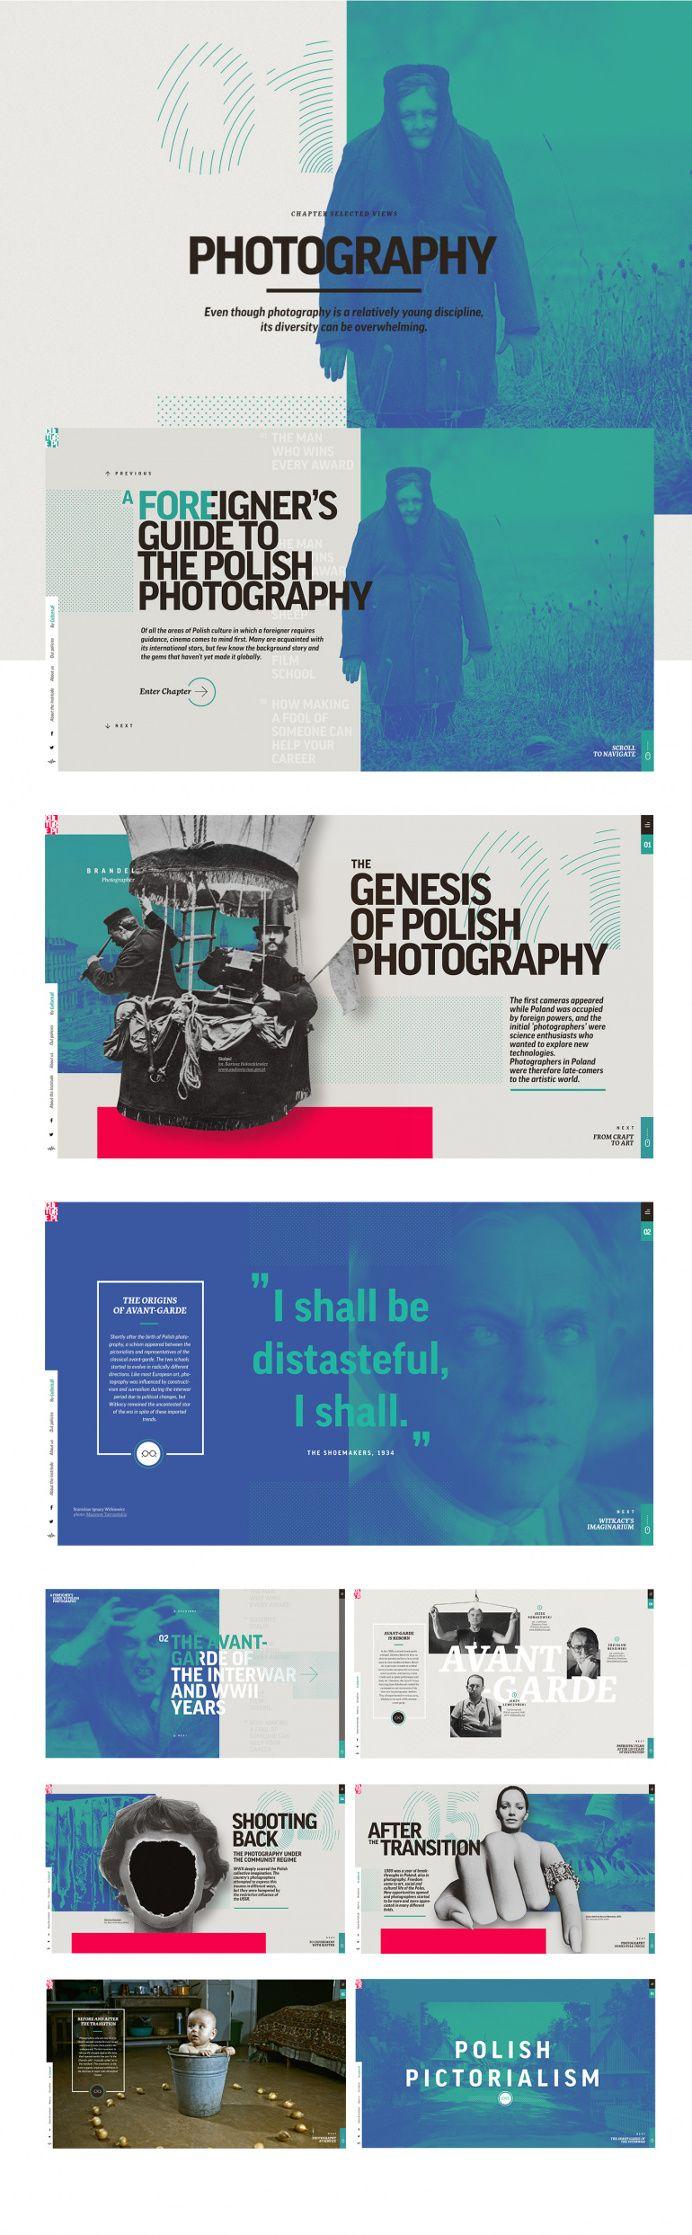 Web design on Designspiration